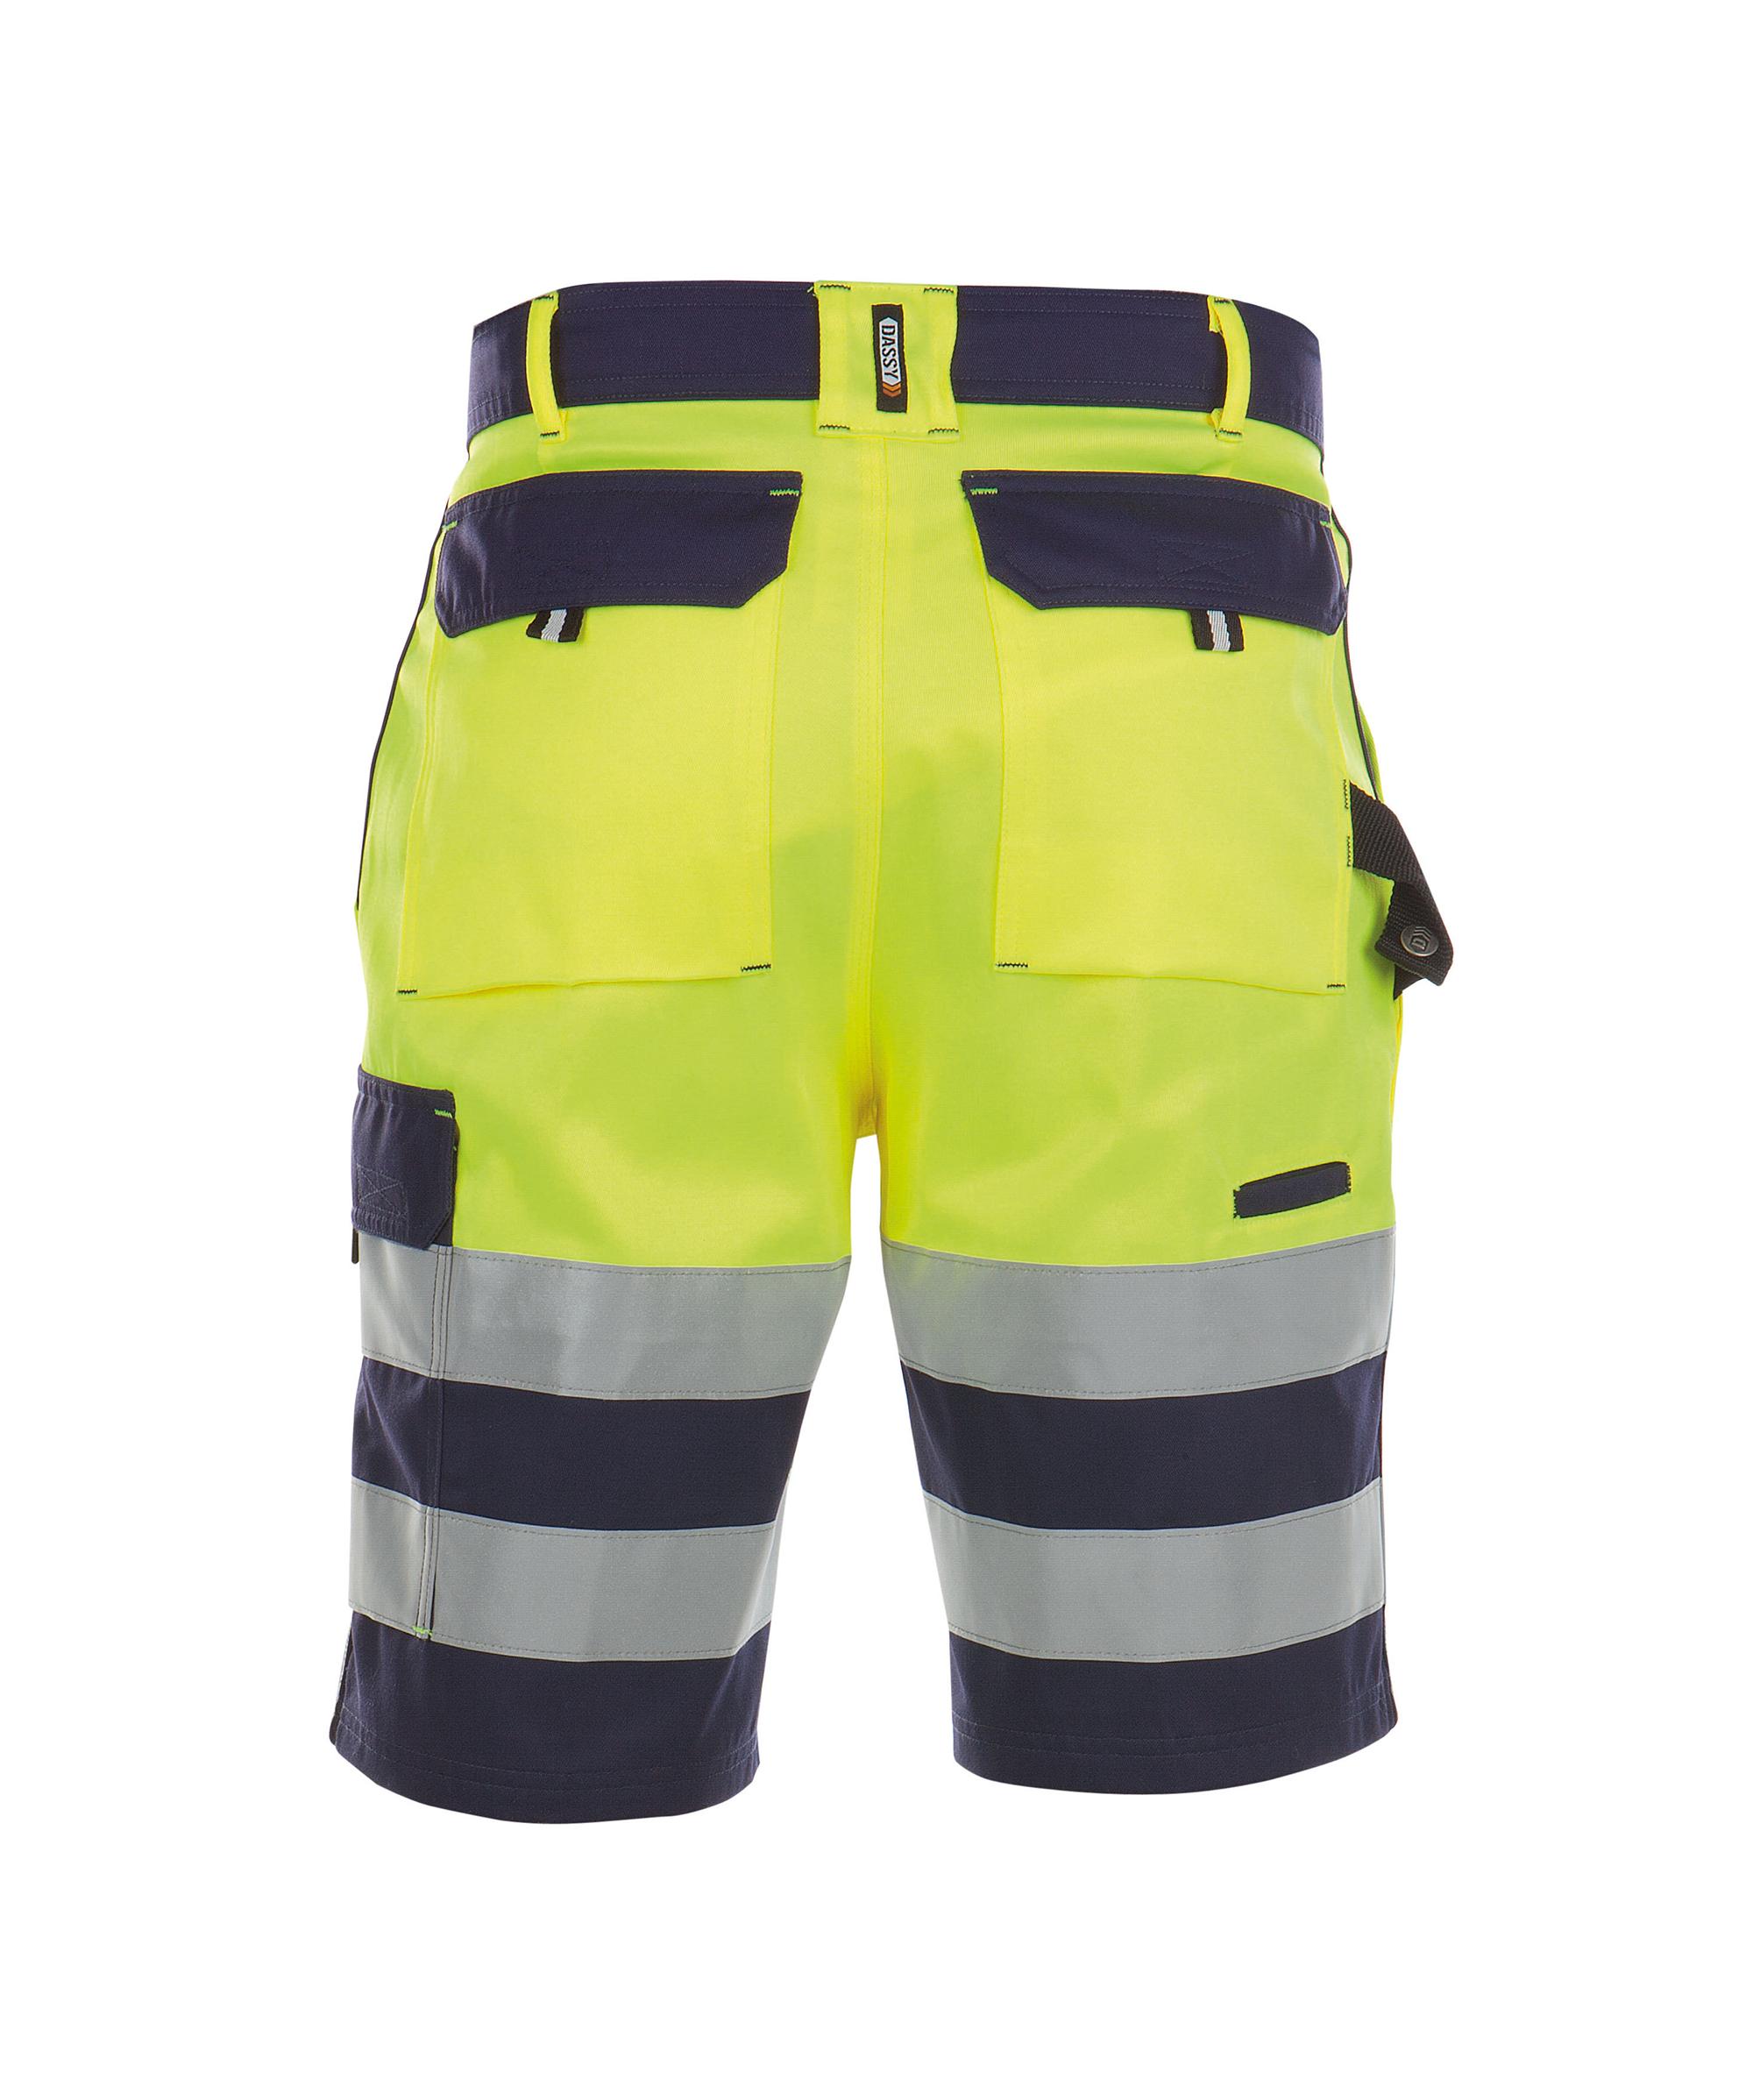 Dassy, Venna Warnschutz Shorts 250030